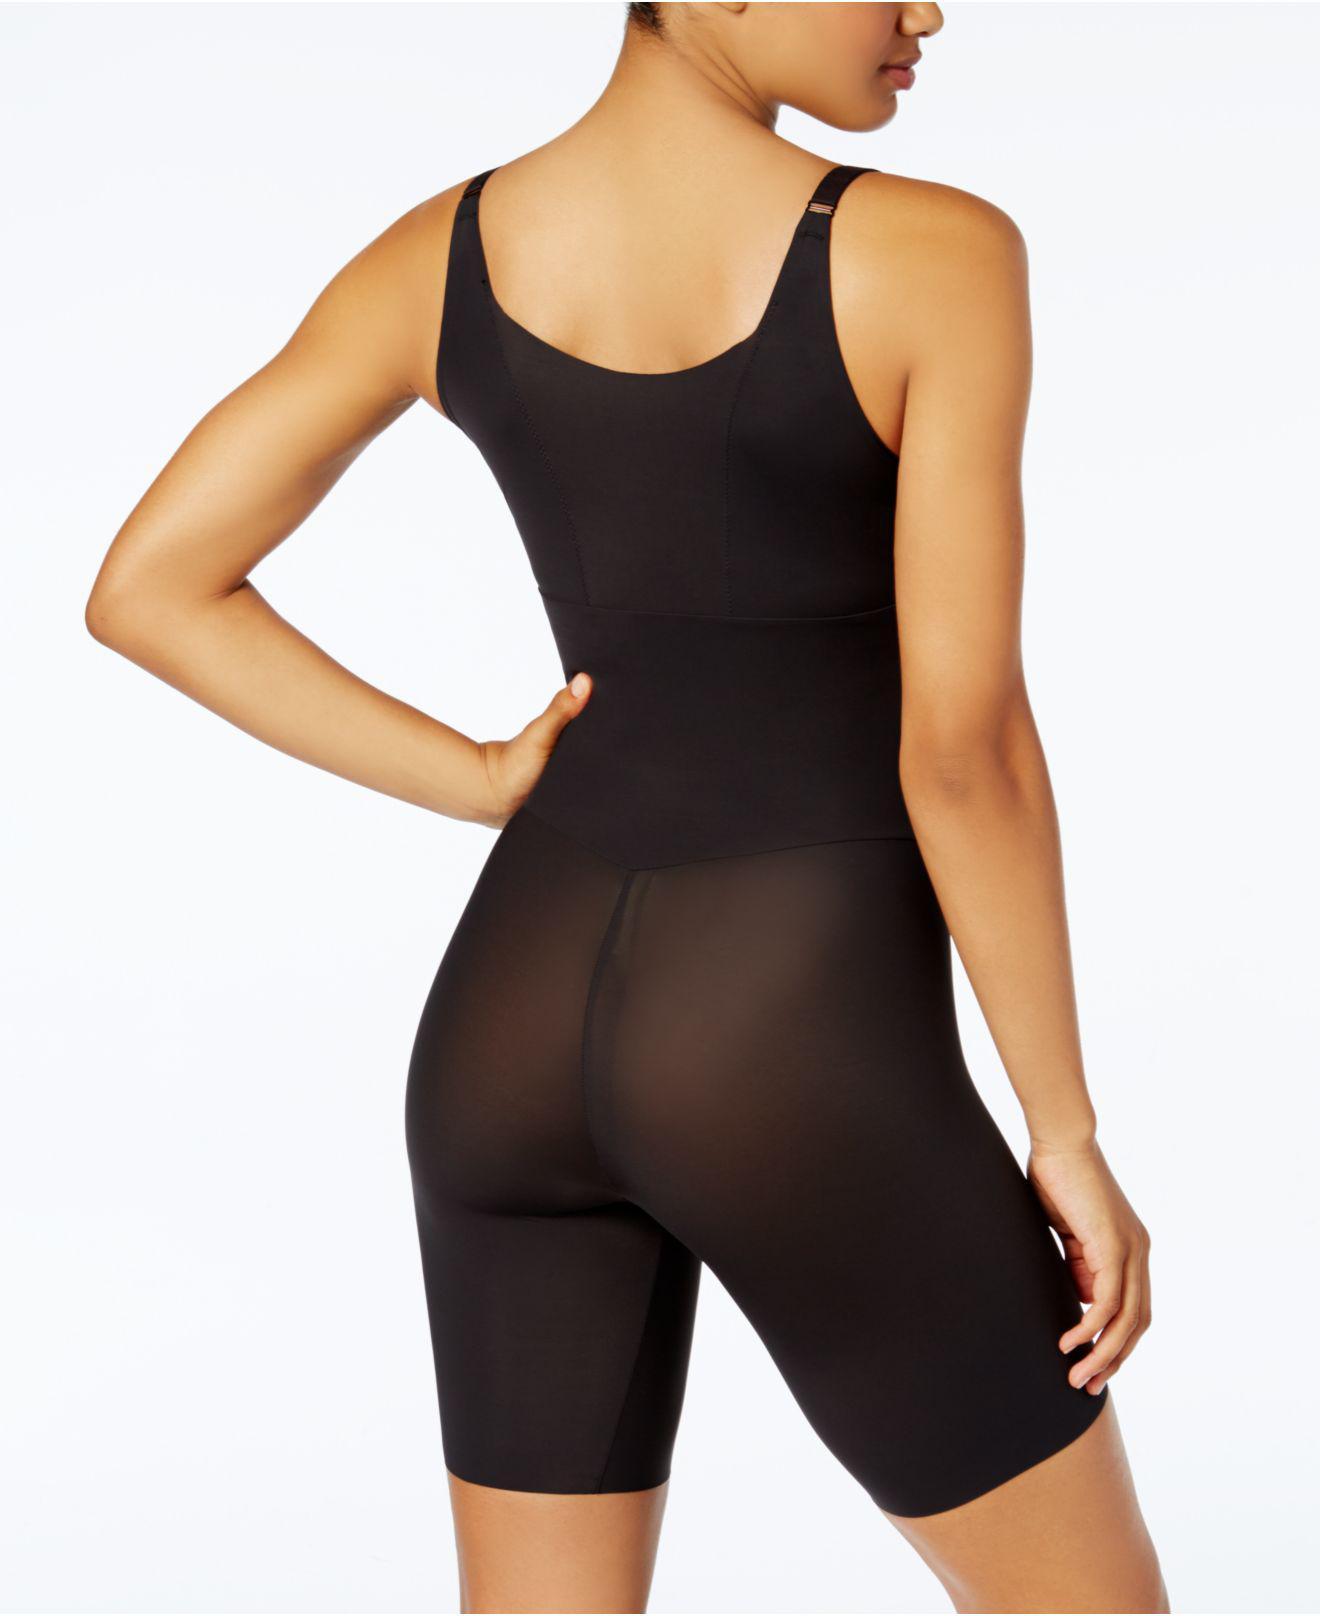 61f05fe4c8 Maidenform Firm Tummy-control Instant Slimmer Long Leg Open Bust Body Shaper  2556 in Black - Lyst